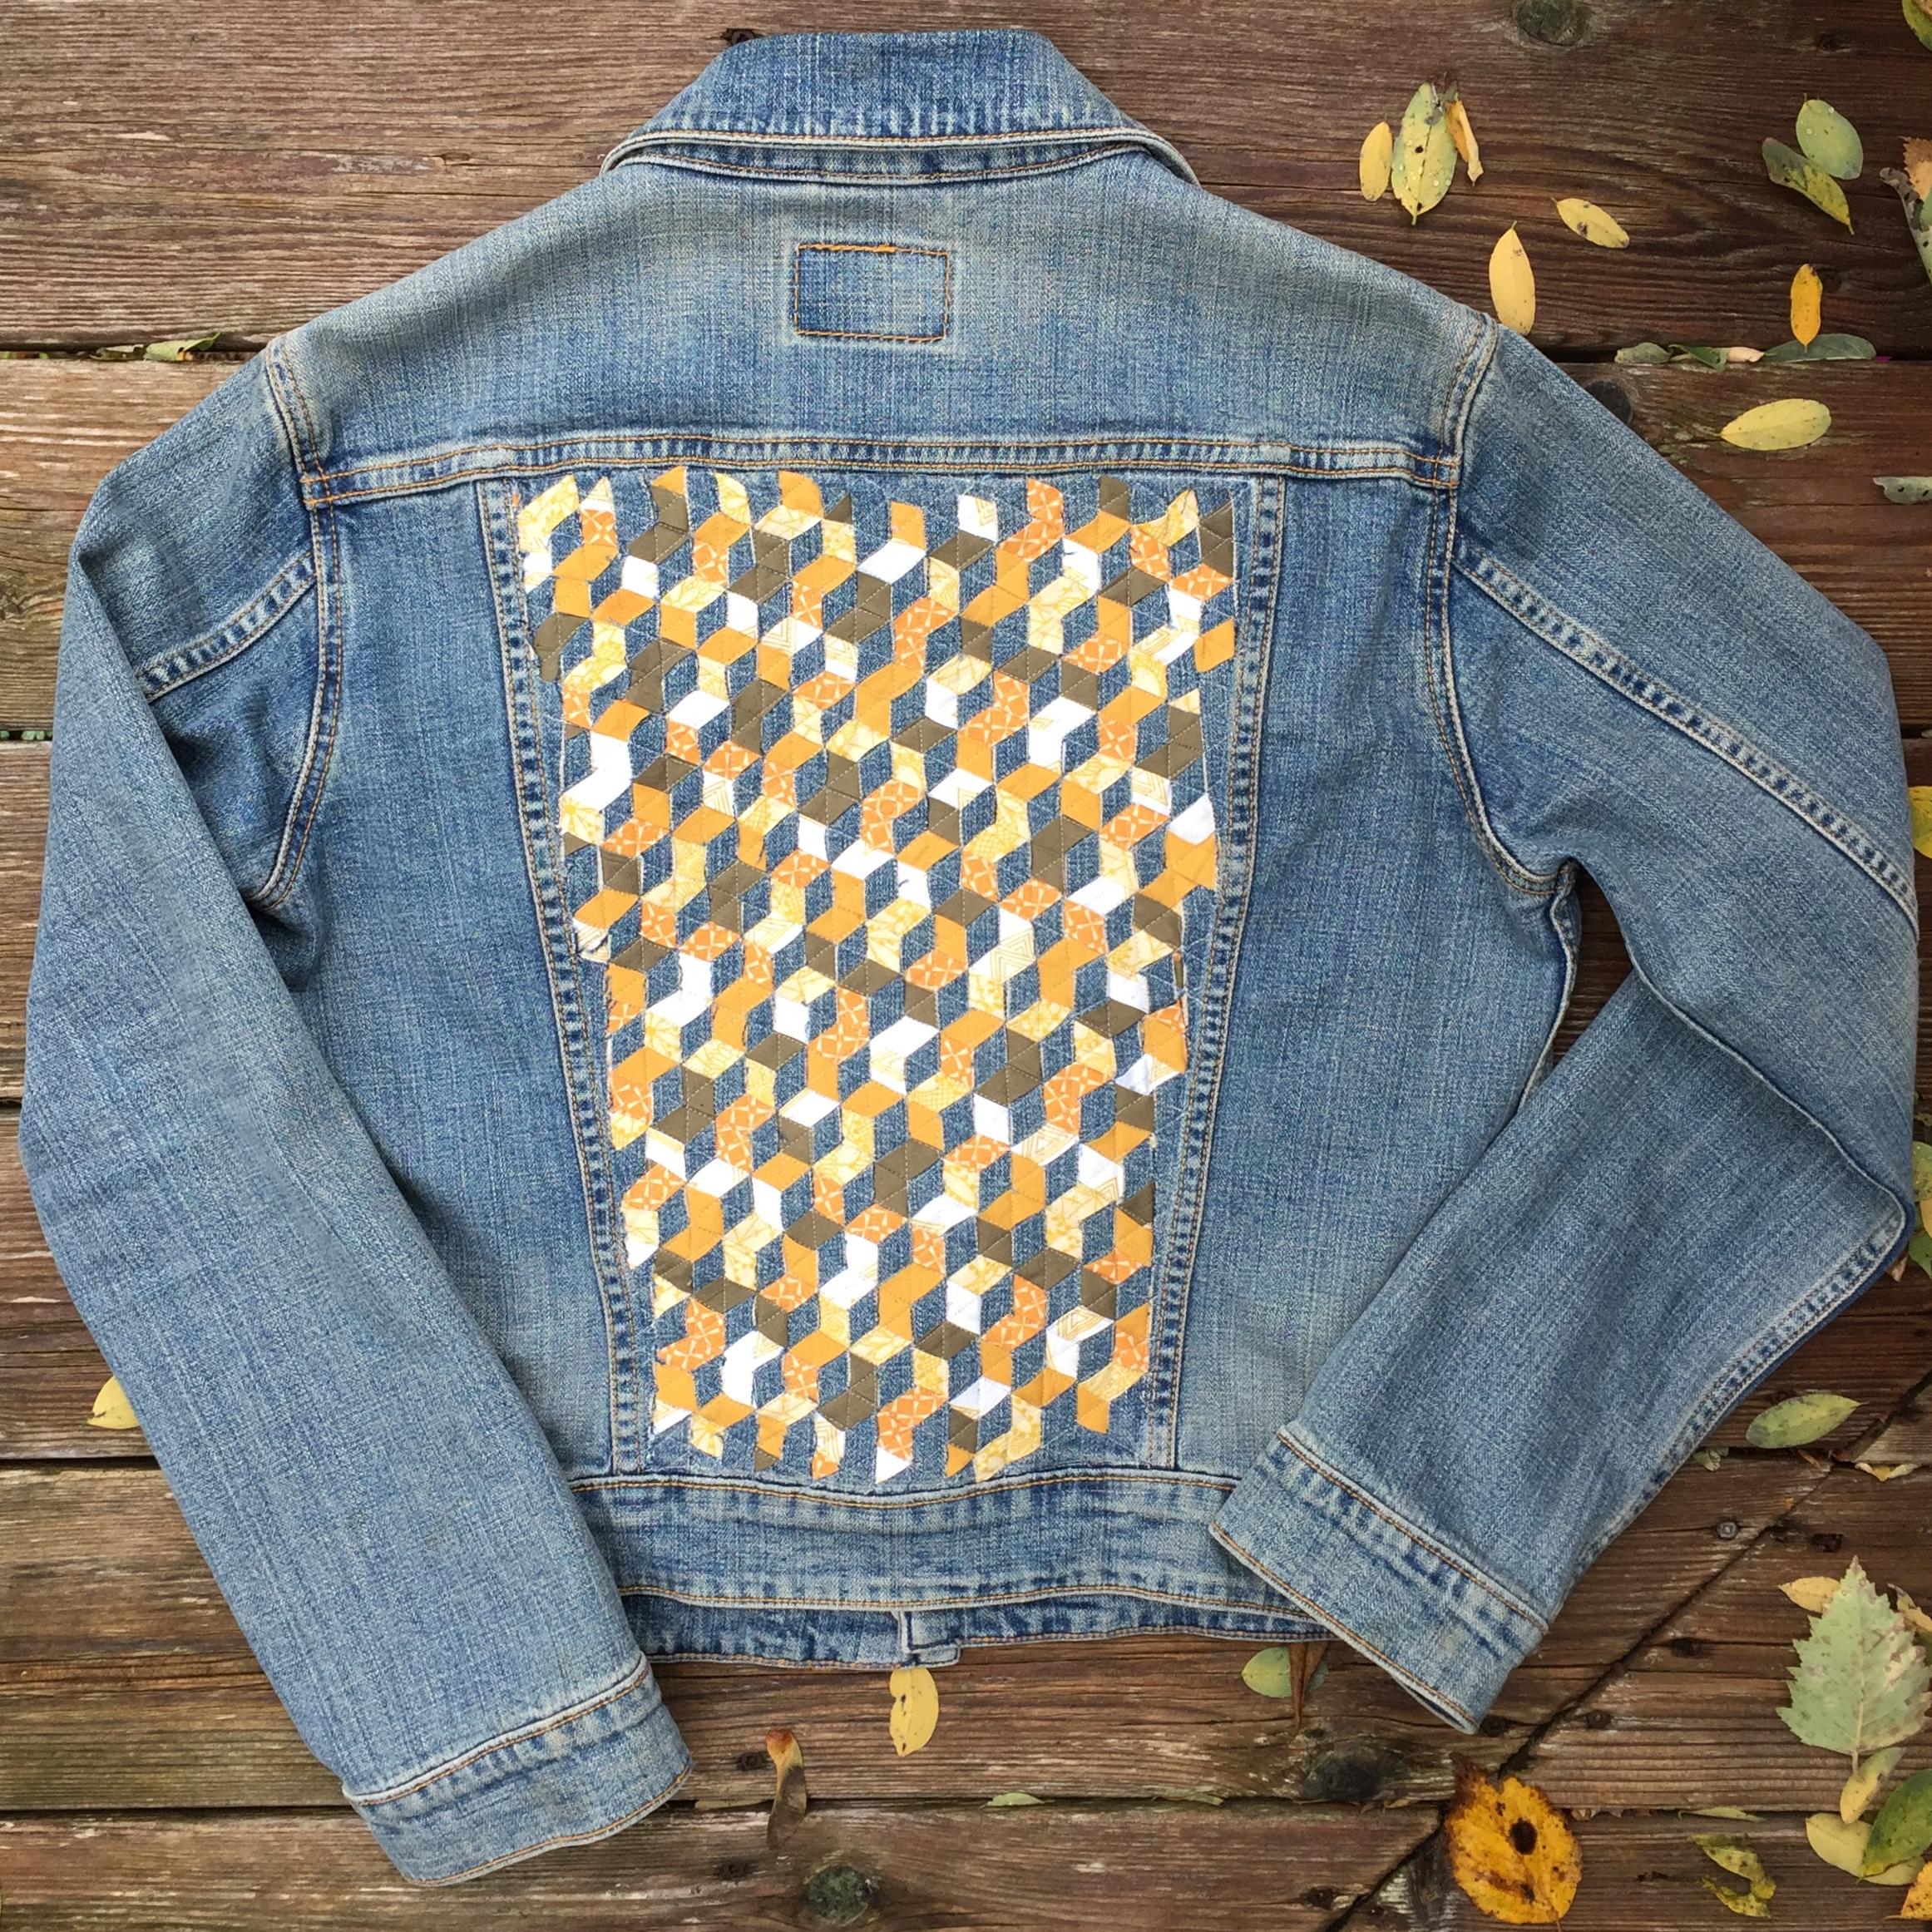 Upcycled Levi Strauss jean jacket!